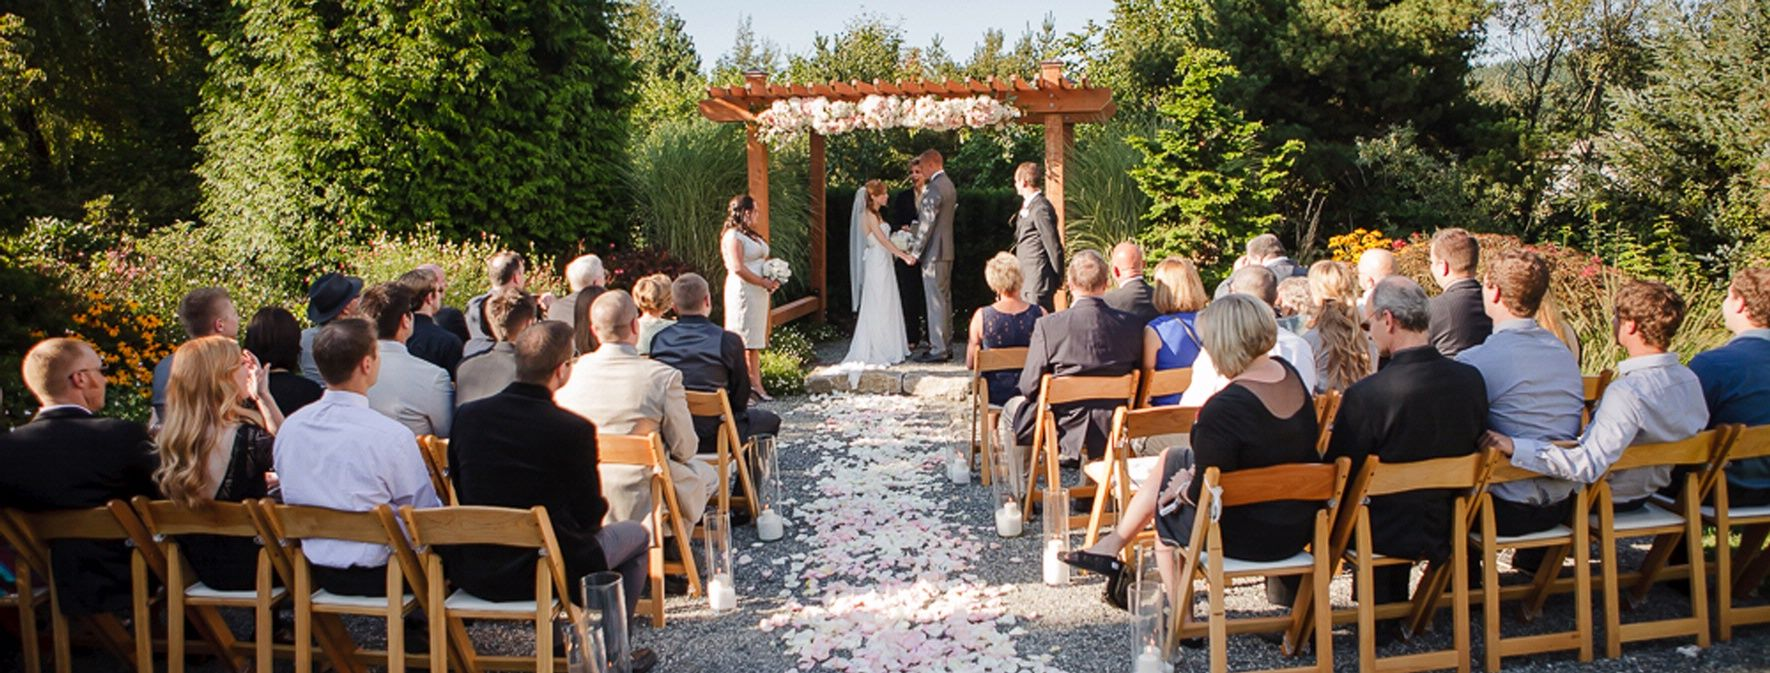 Intimate wedding venue in Washington state. Willow lodge | Doug + ...